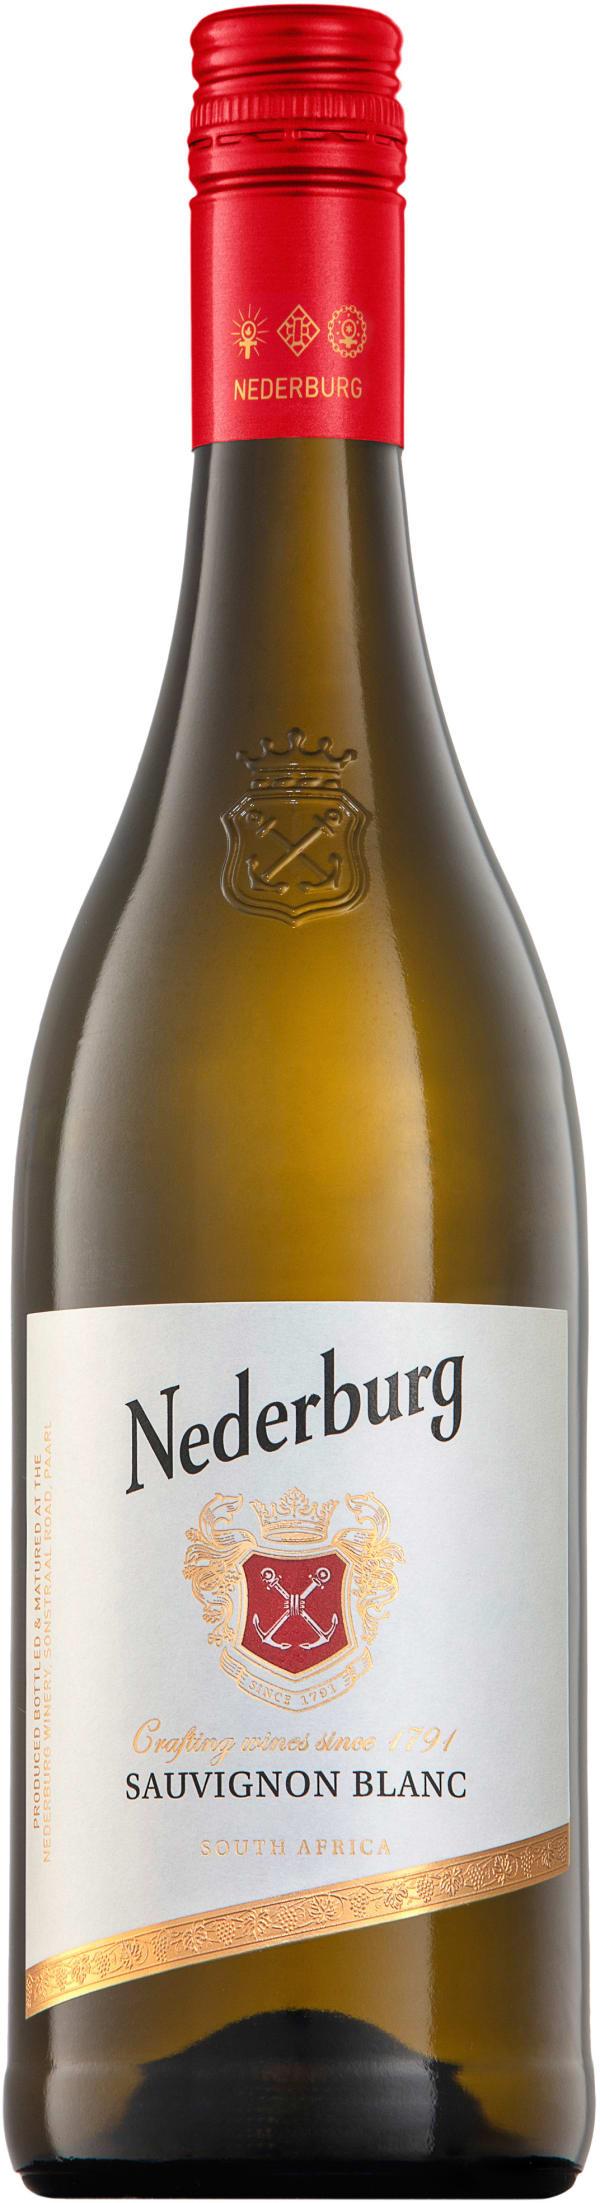 Nederburg Sauvignon Blanc 2020